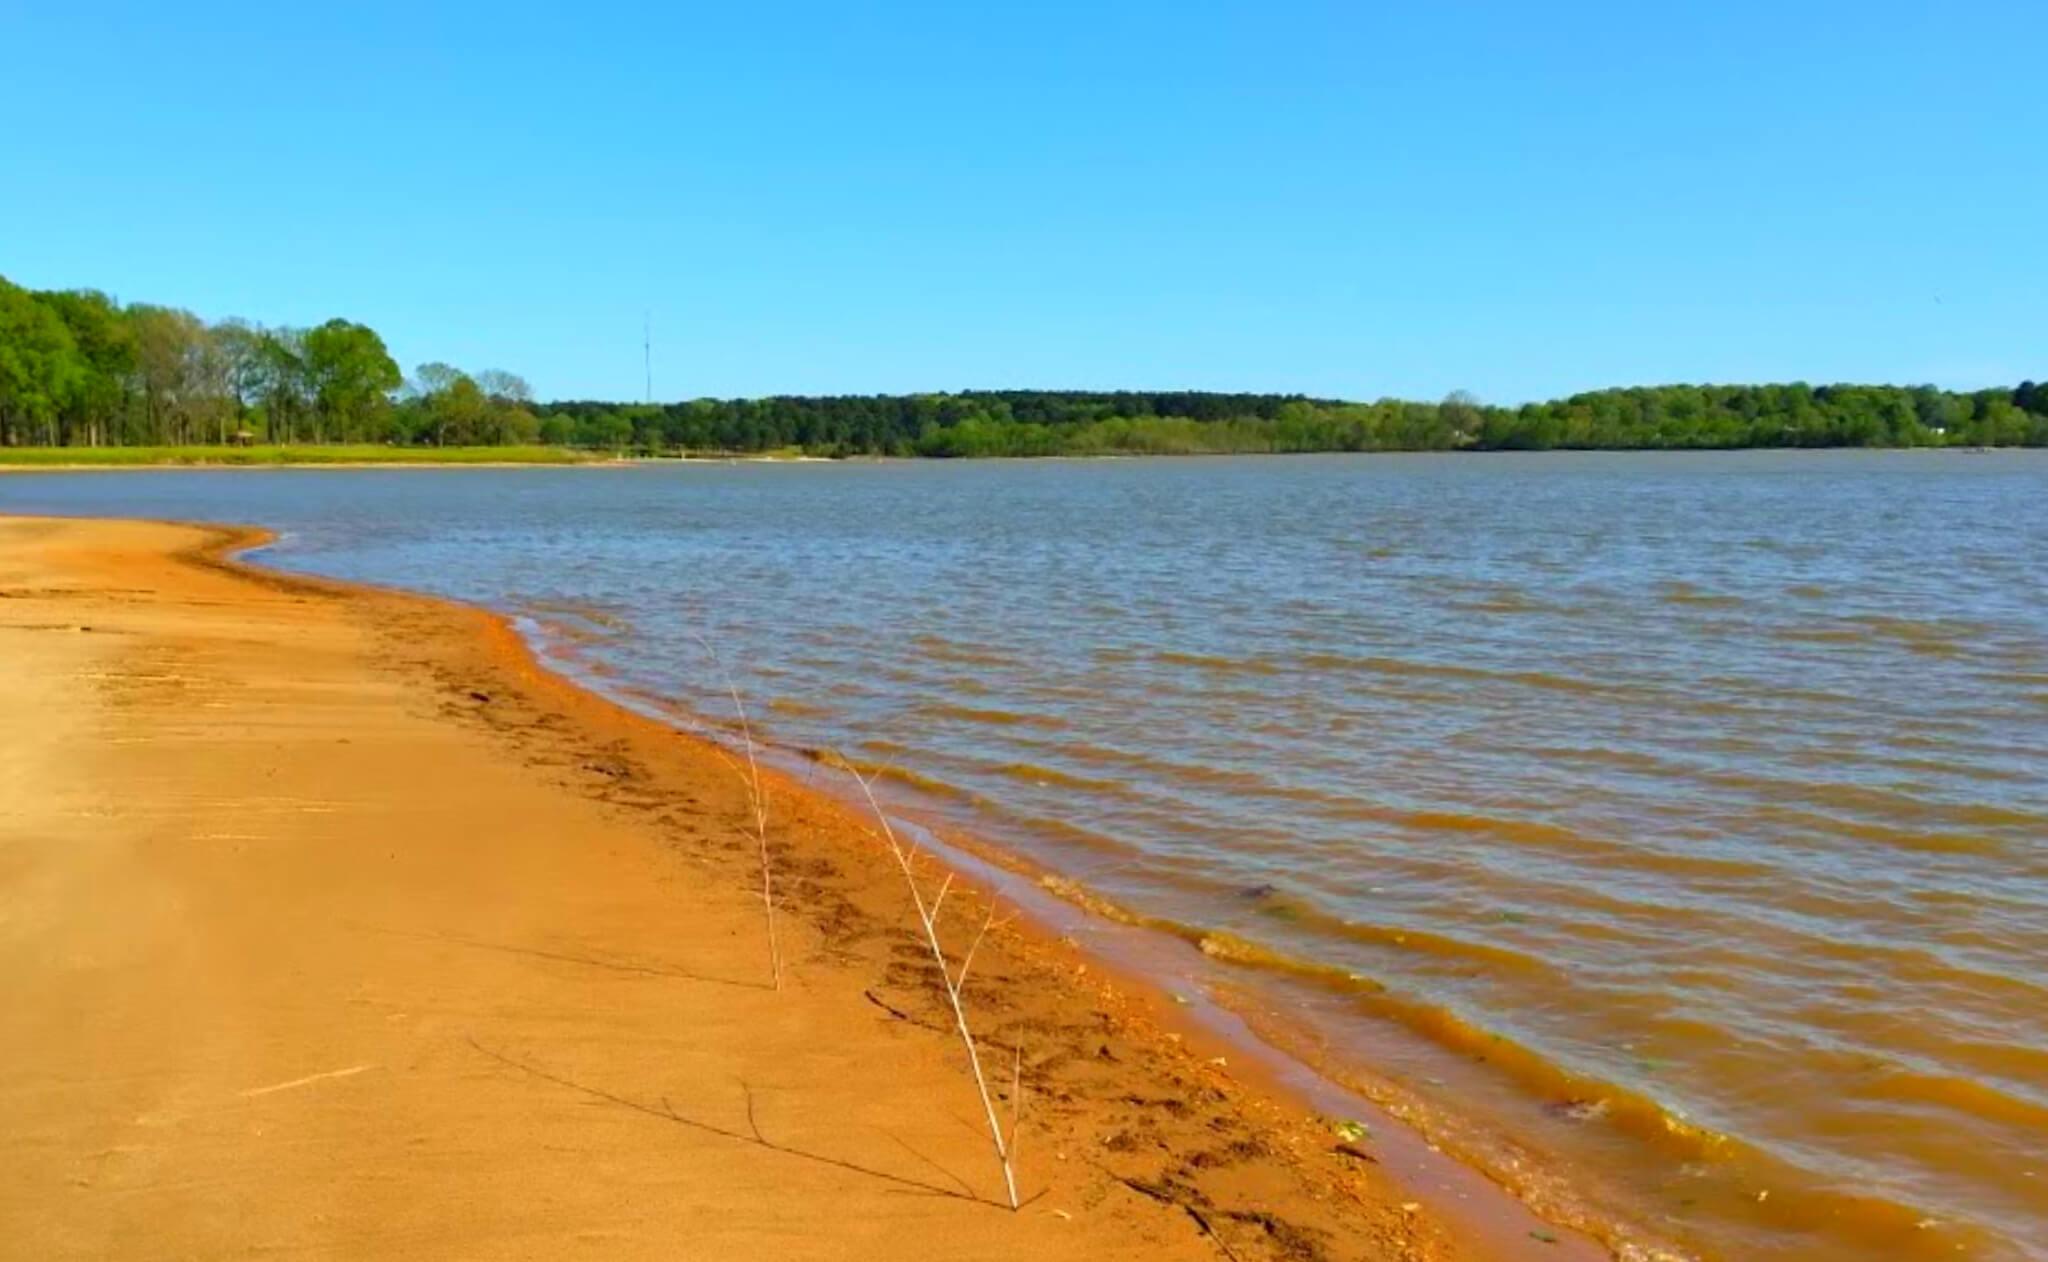 Sardis-Lake-Fishing-Report-Guide-Mississippi-MS-03